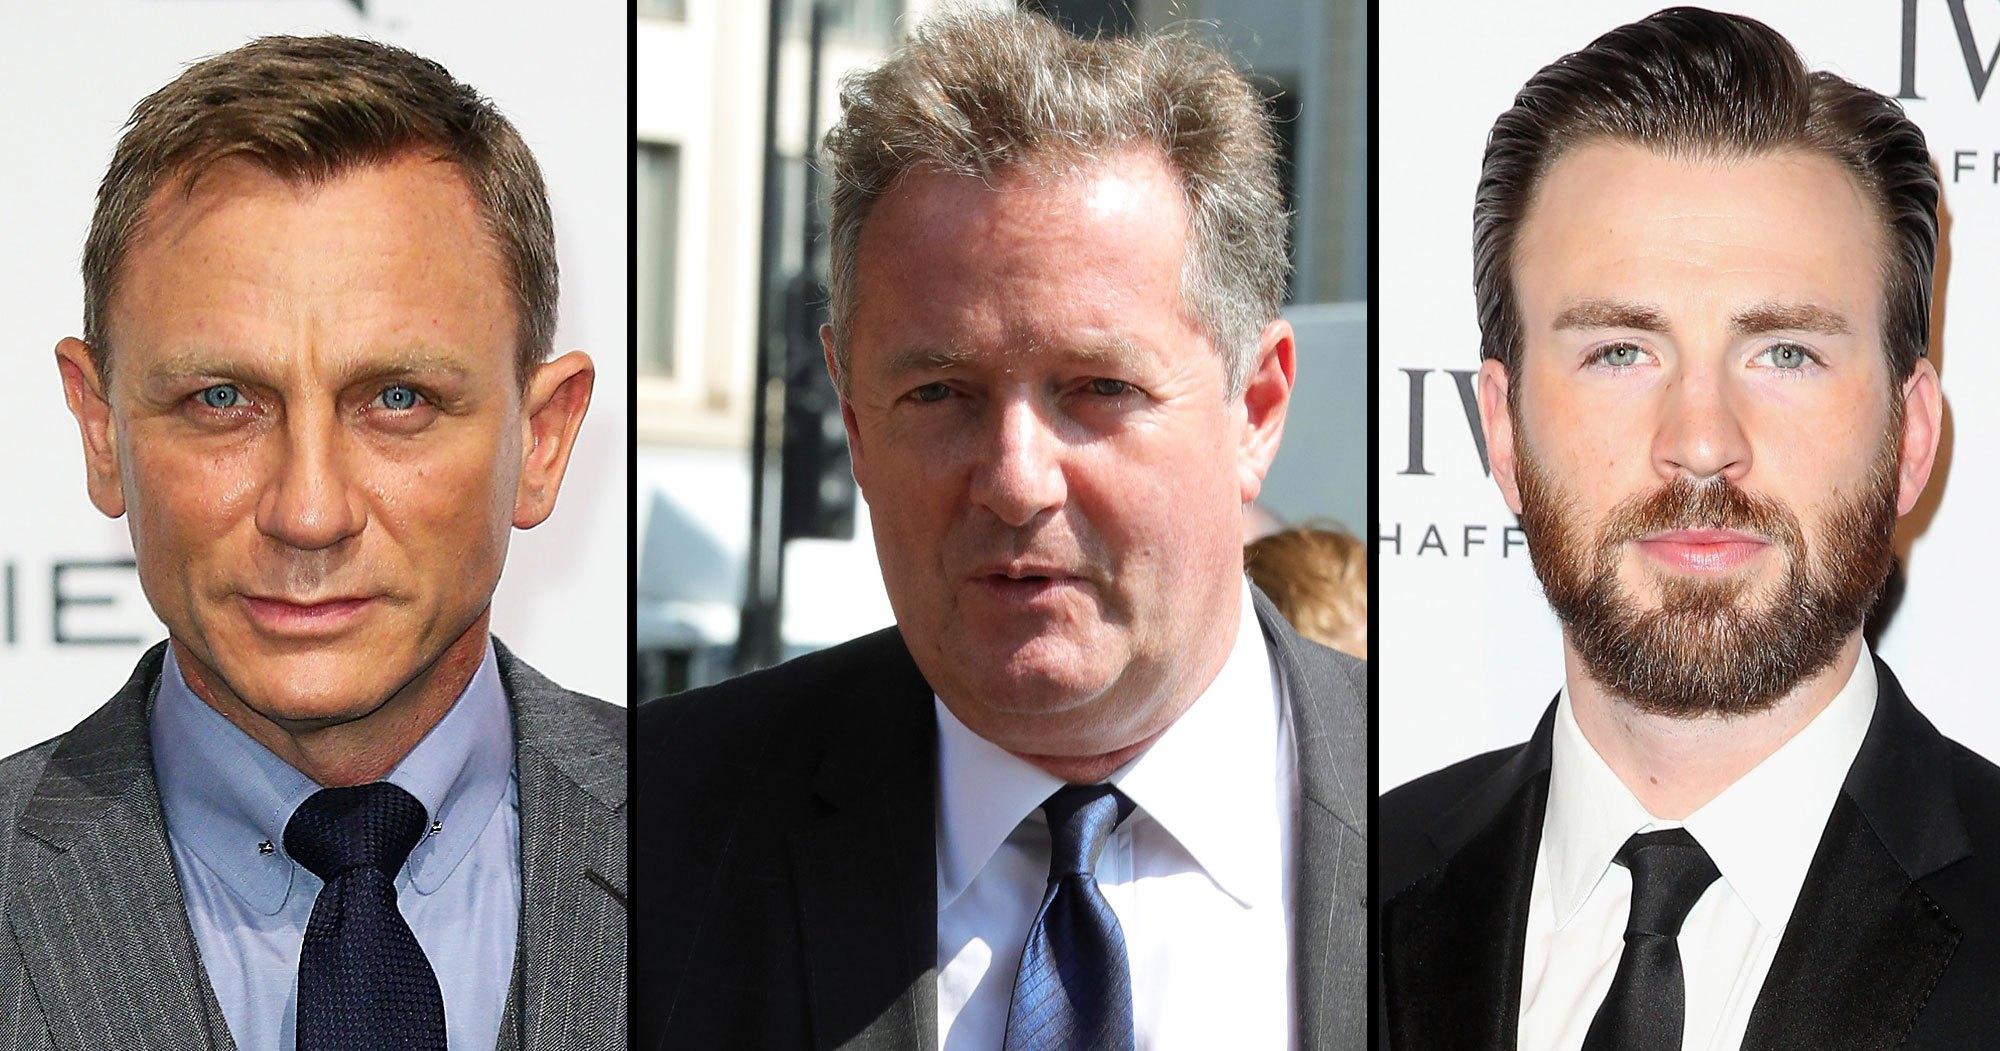 Daniel Craig Gets Dad-Shamed by Piers Morgan — and Chris Evans Claps Back